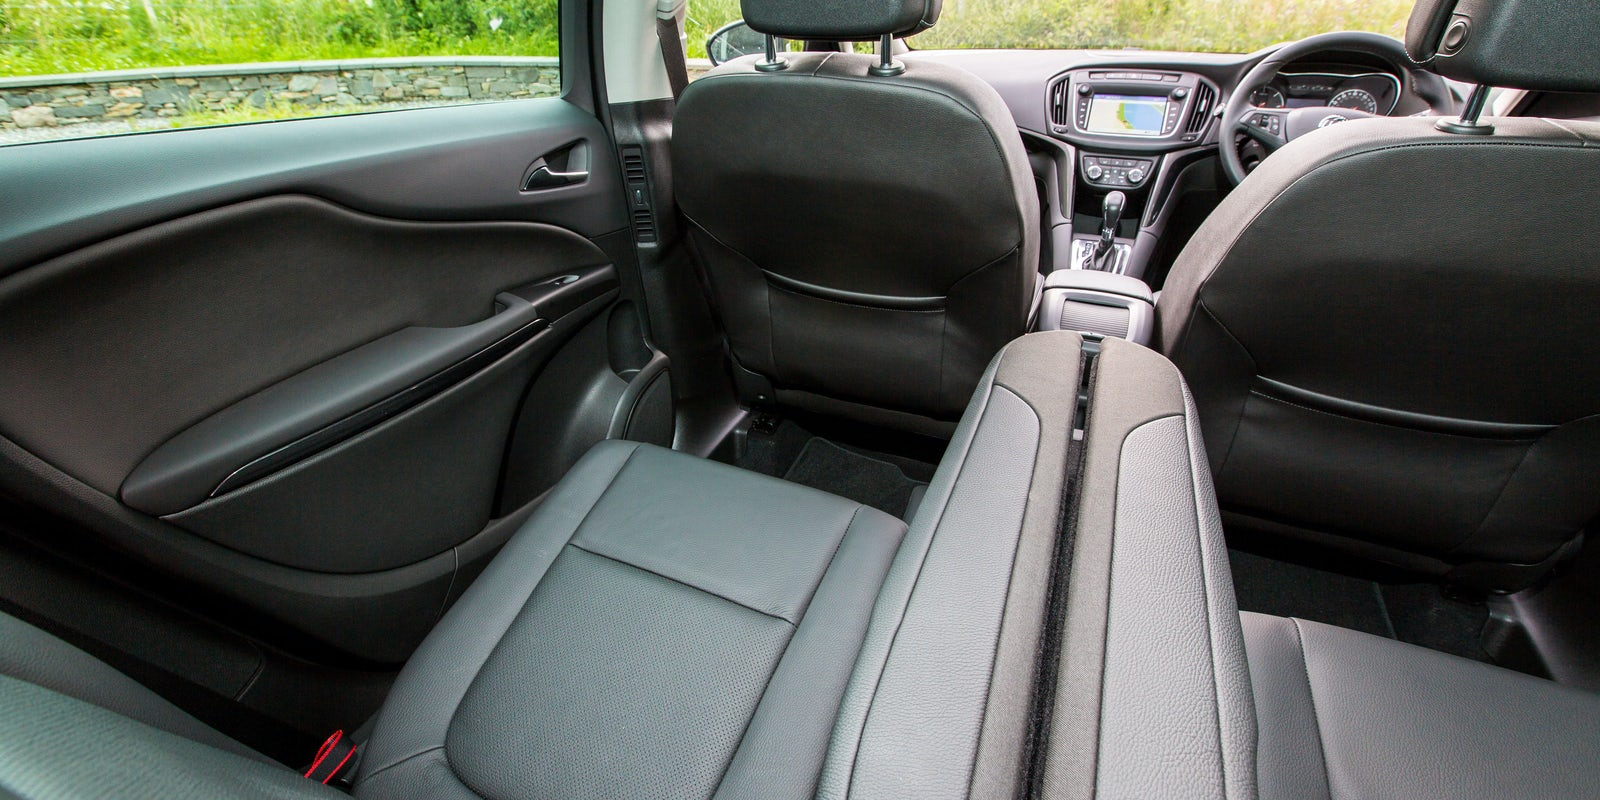 100 opel zafira interior 2016 opel zafira 7 seater for Opel zafira interieur